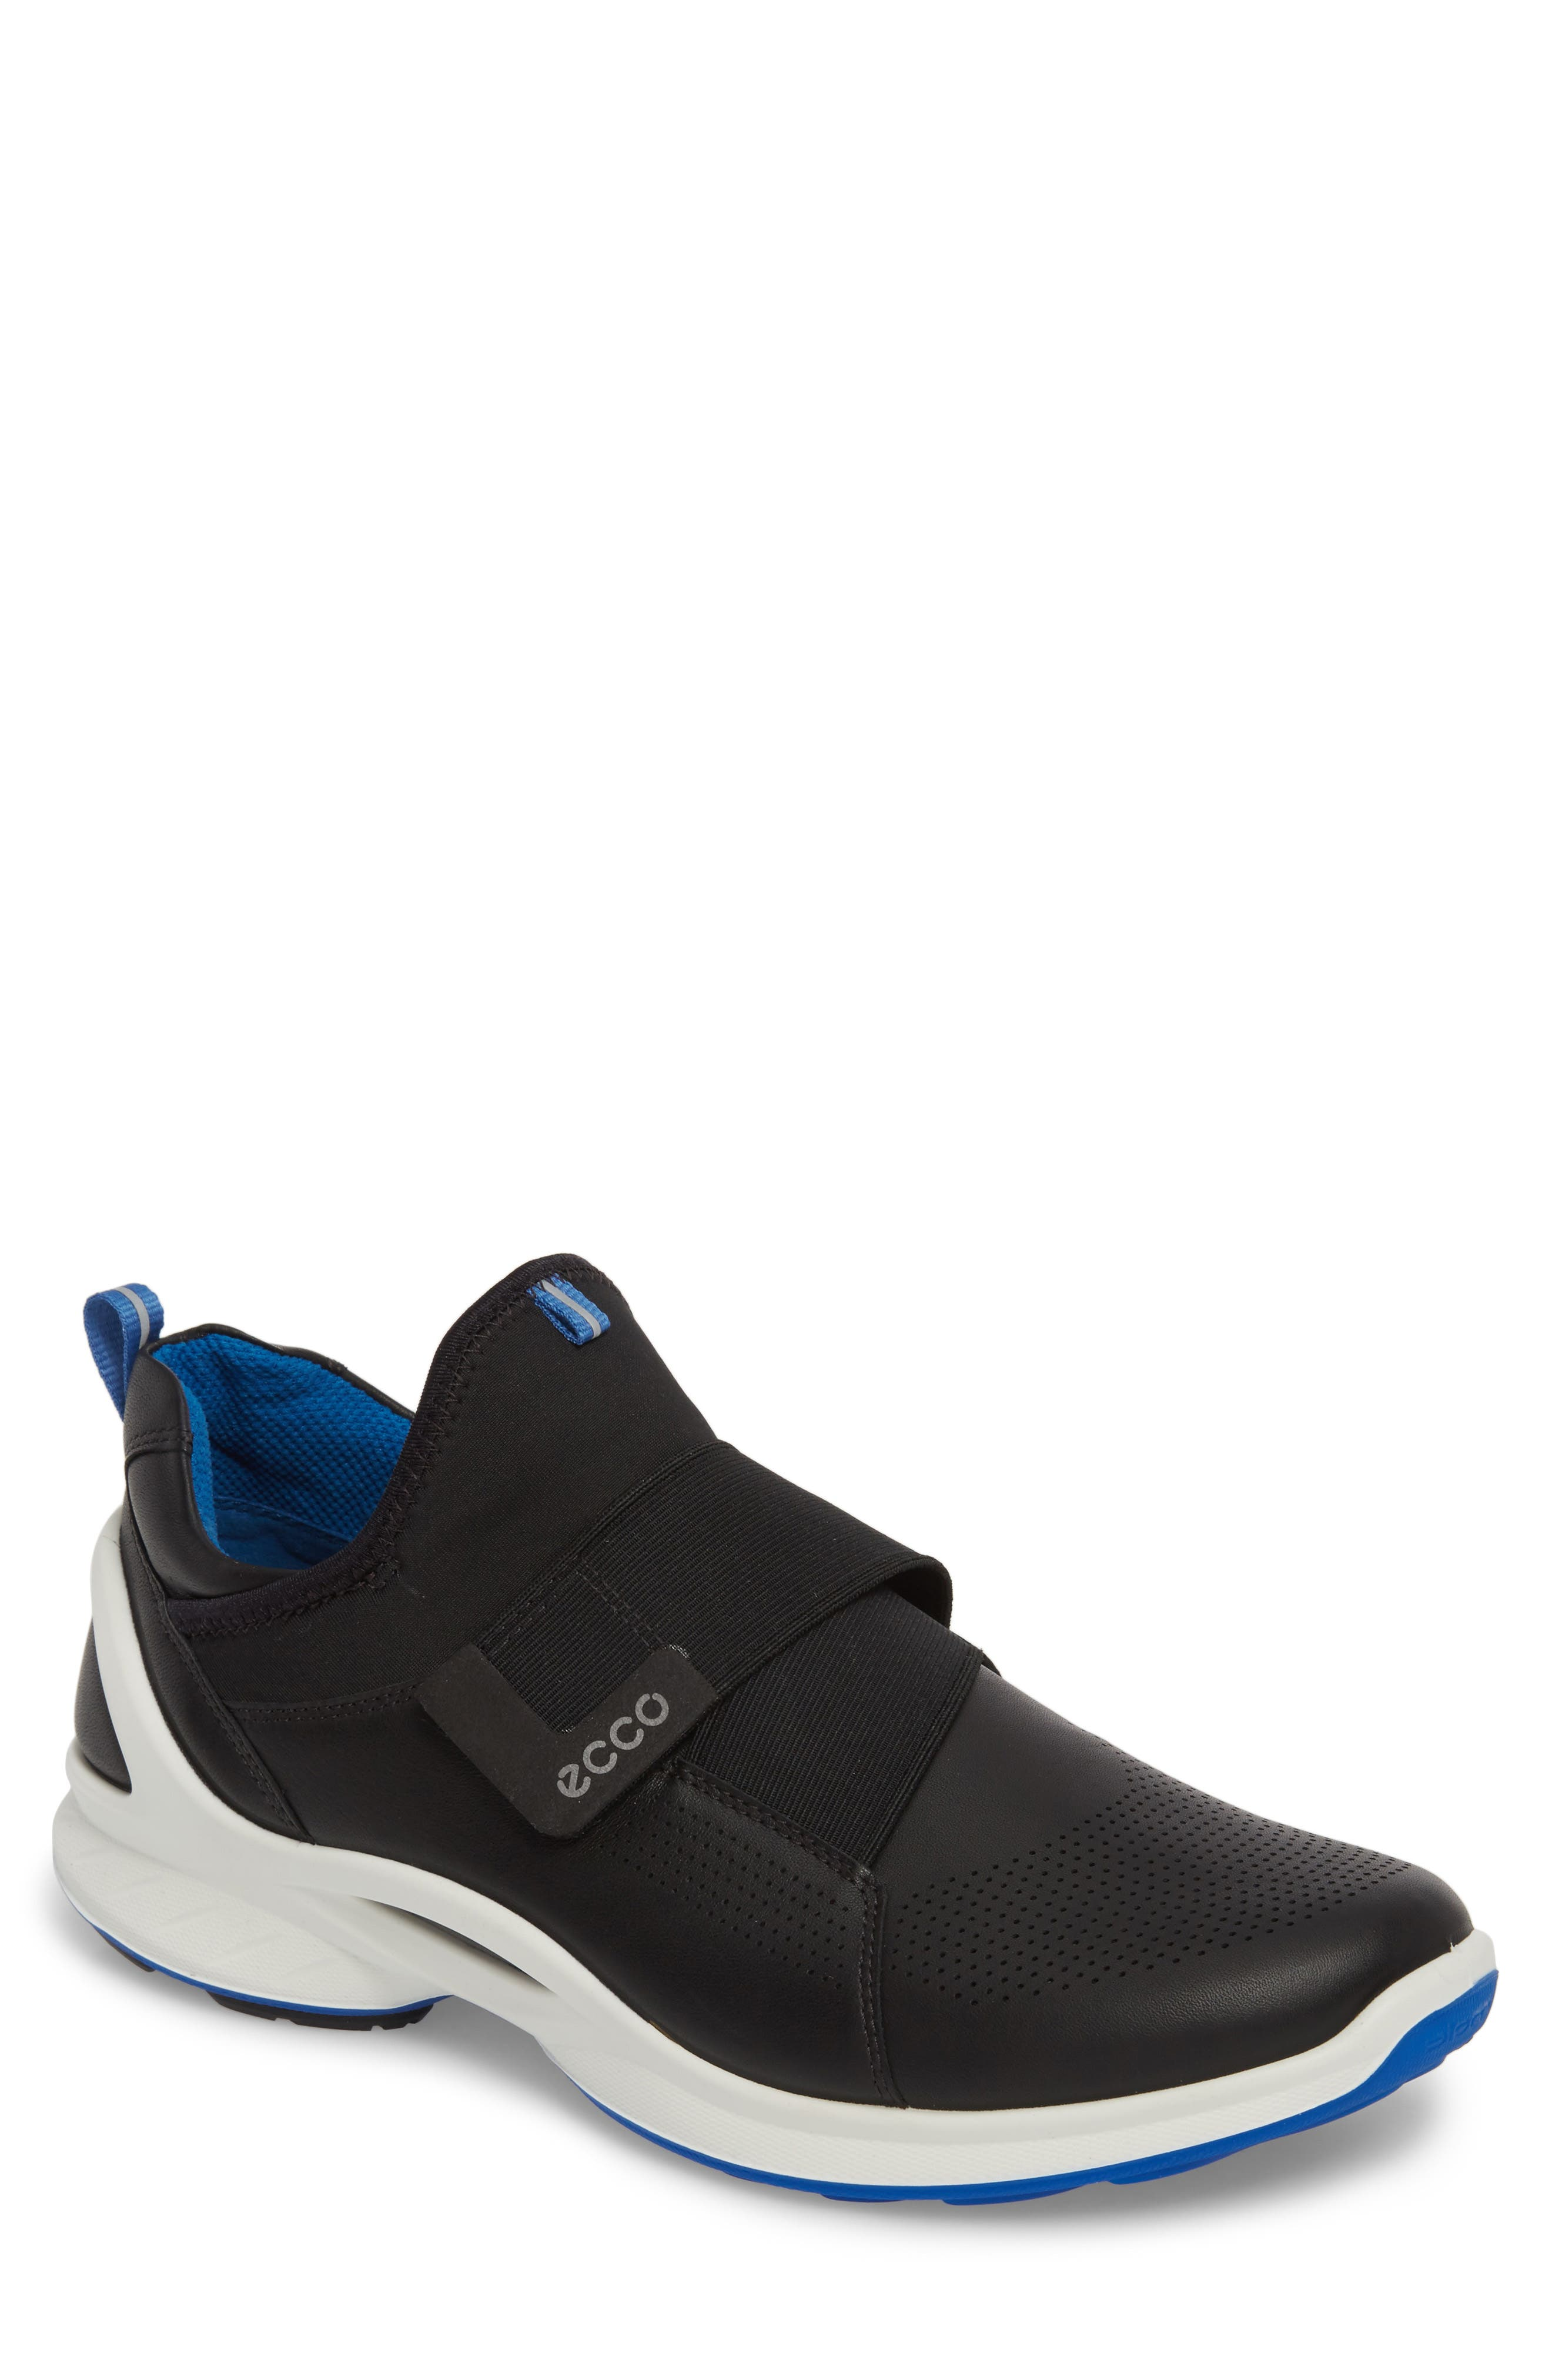 BIOM Fjuel Band Sneaker,                         Main,                         color, 009